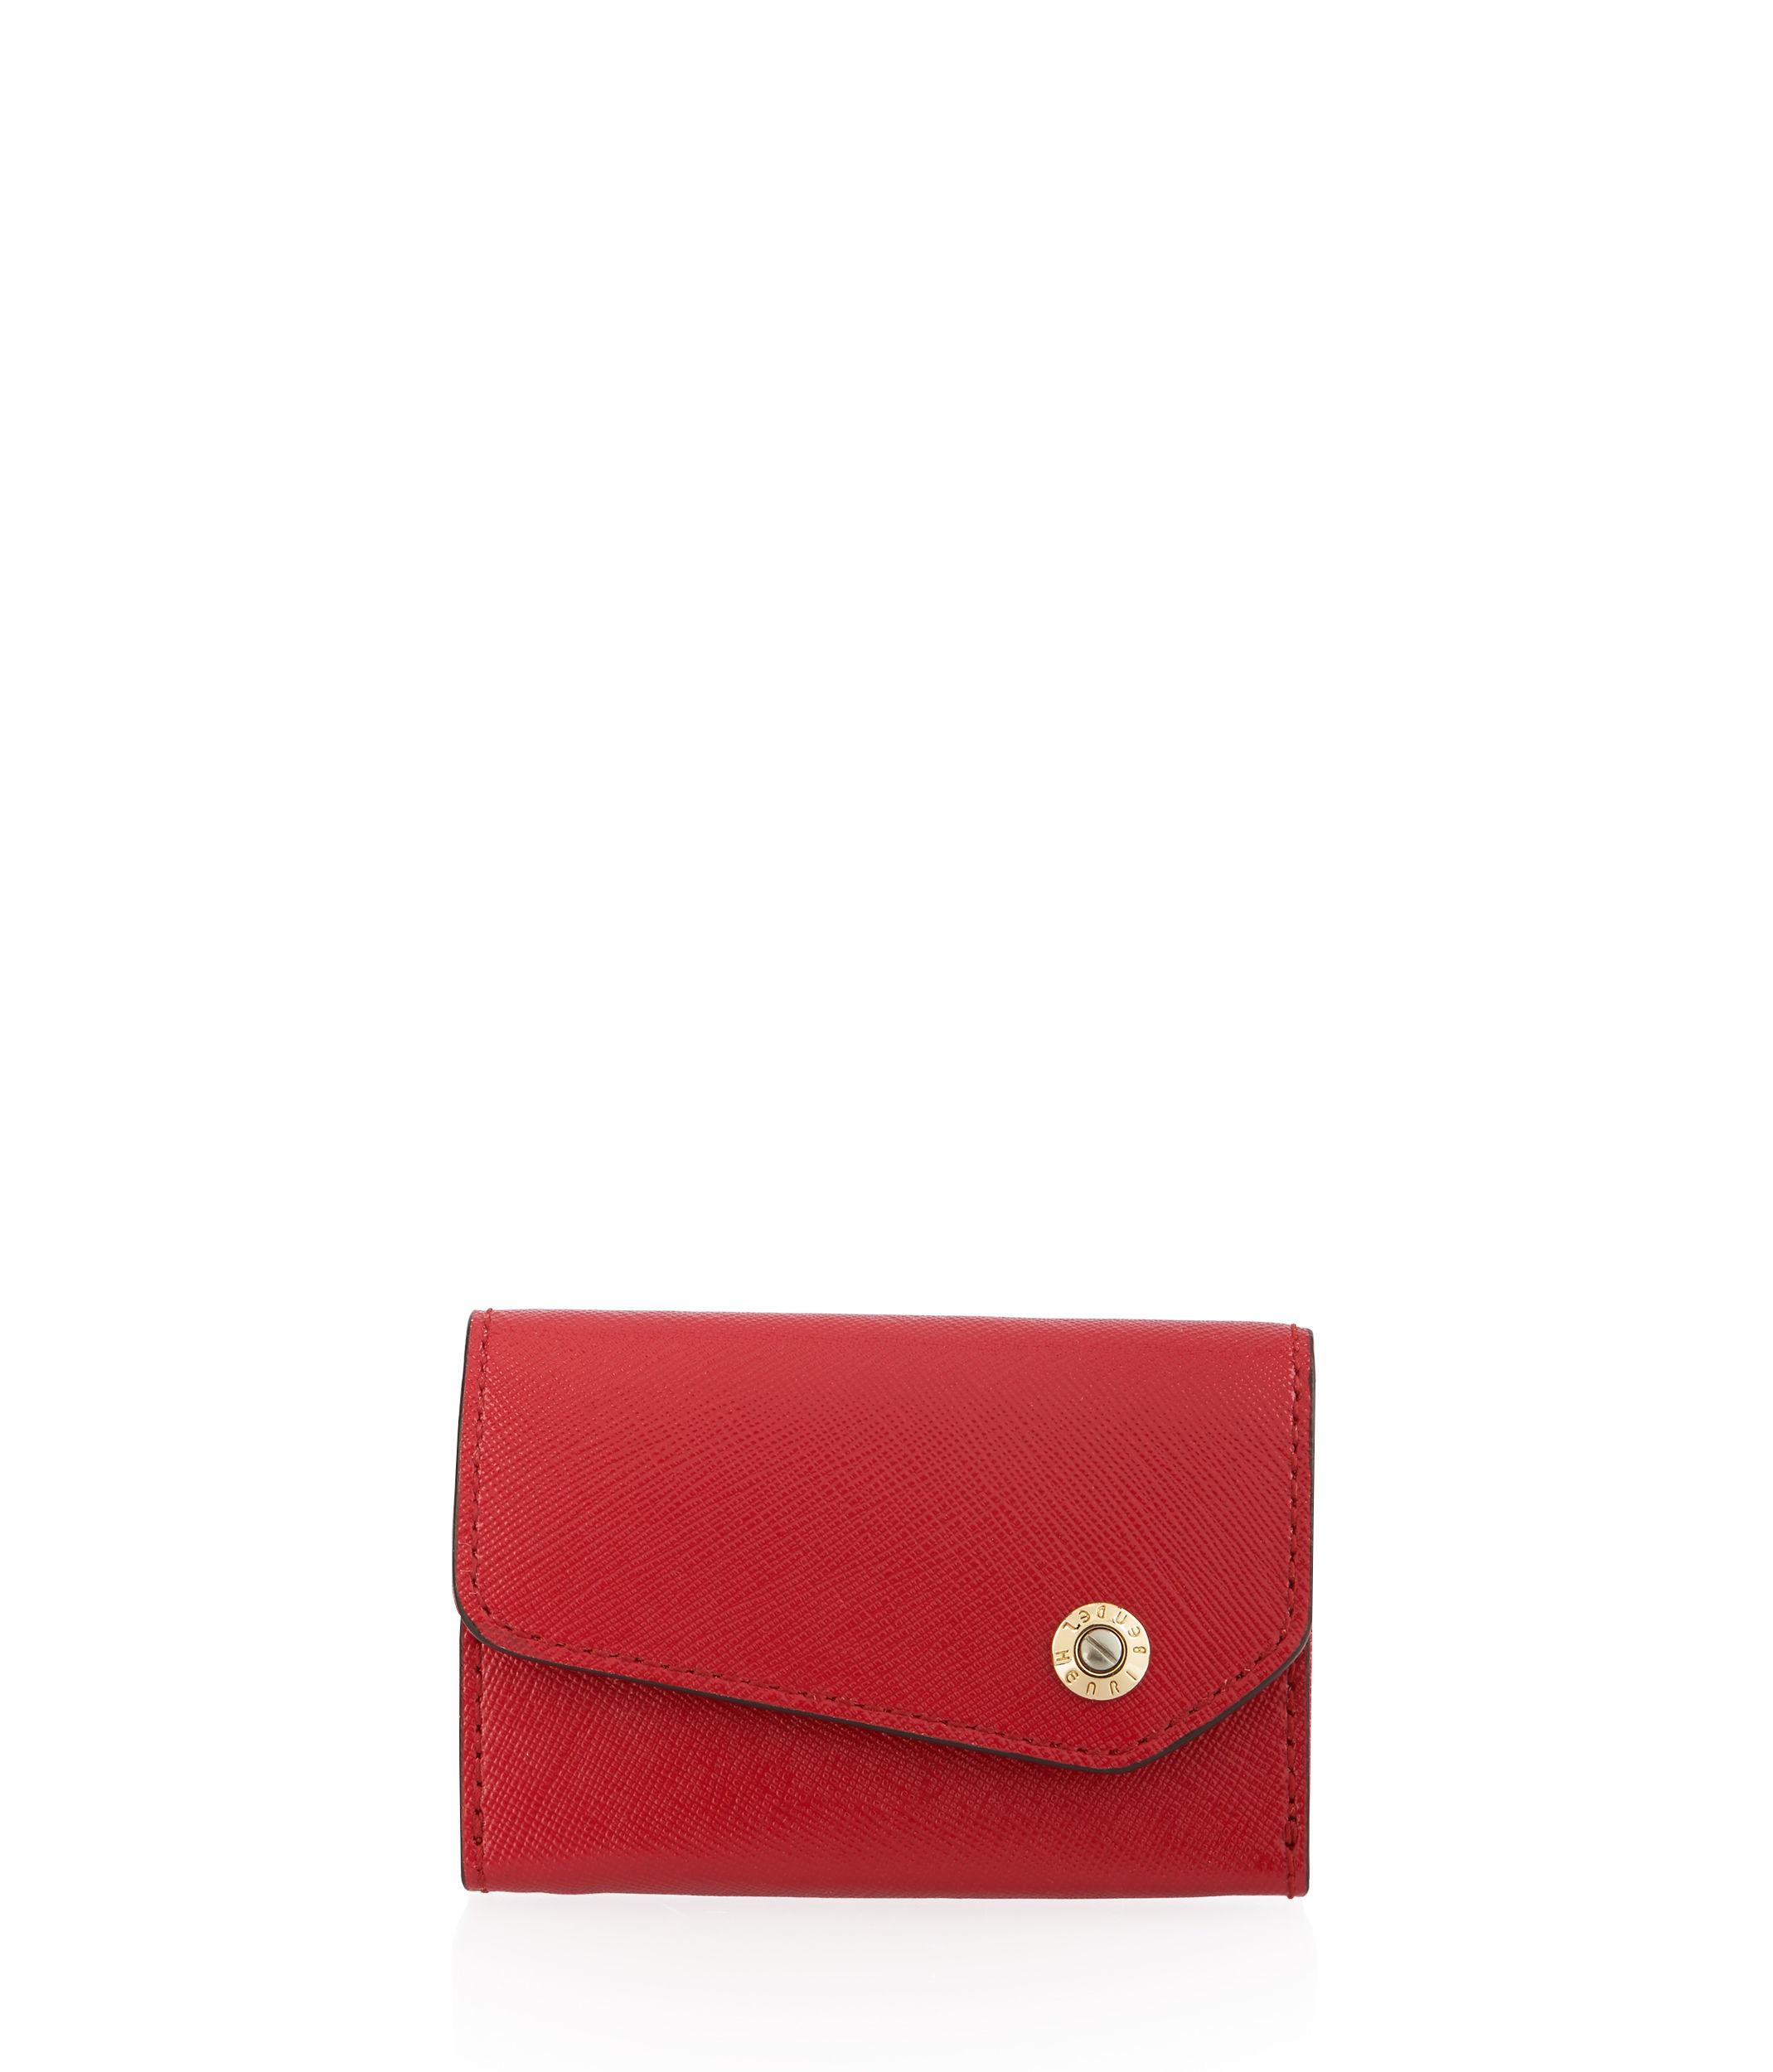 Lyst - Henri Bendel Mind Your Business Card Case in Red